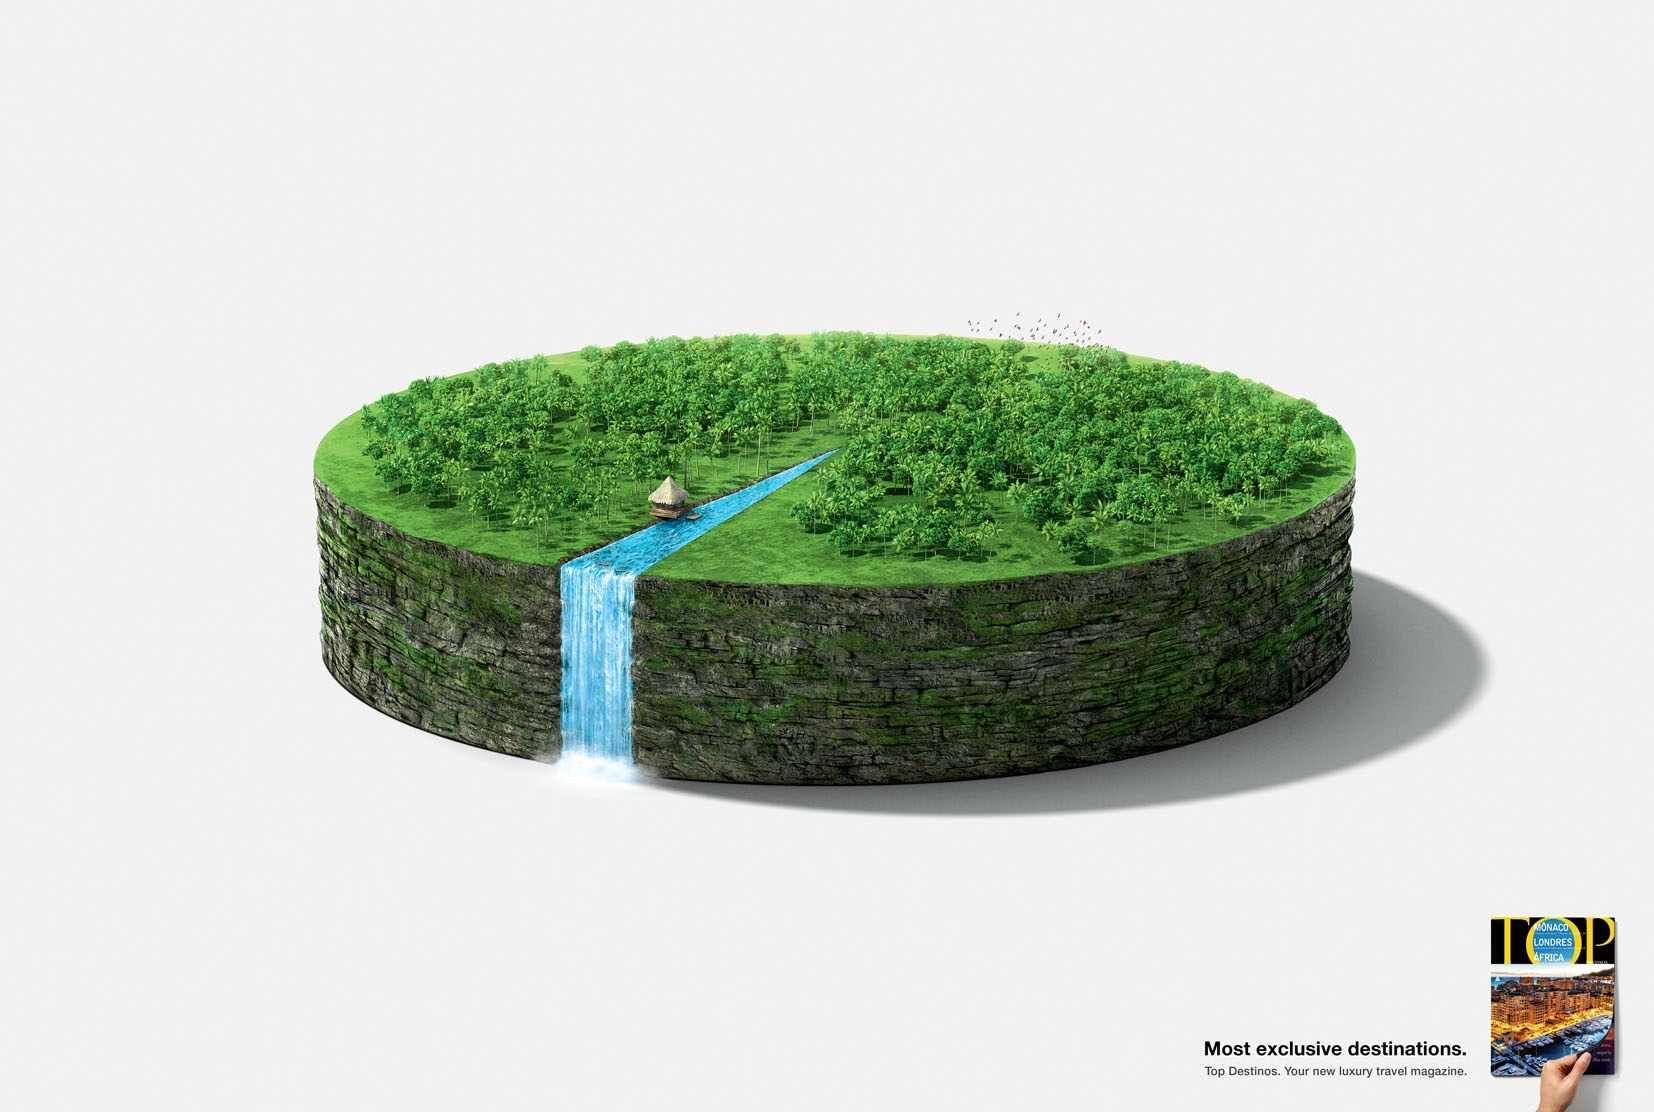 TOP Destinos: Waterfall Most exclusive destinations. Advertising Agency: ALMAPBBDO, Brazil